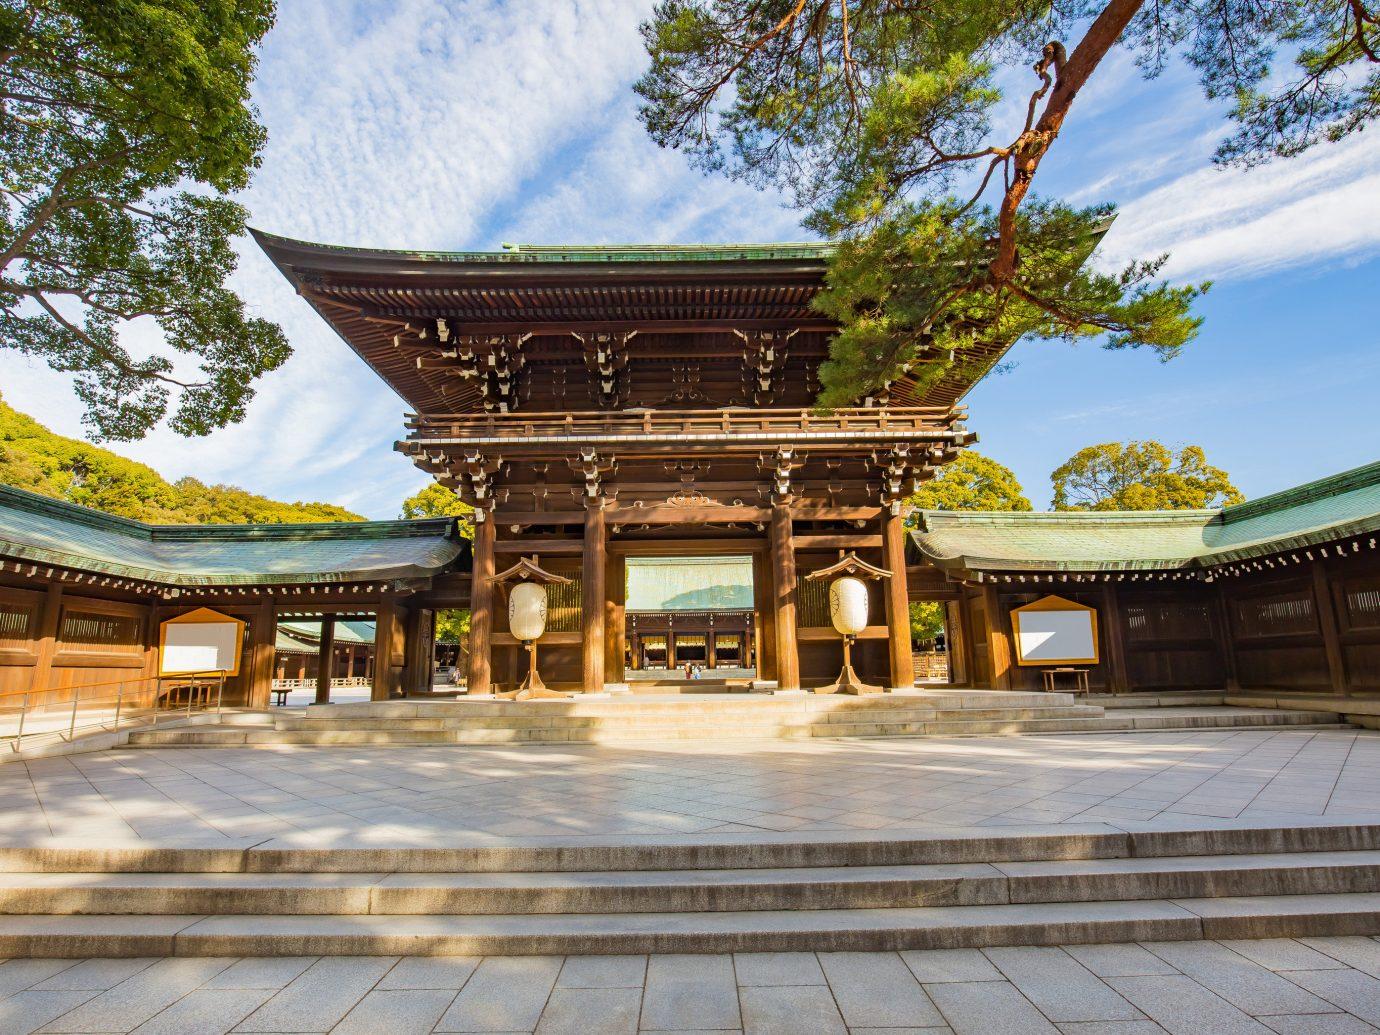 Temple in Tokyo Japan